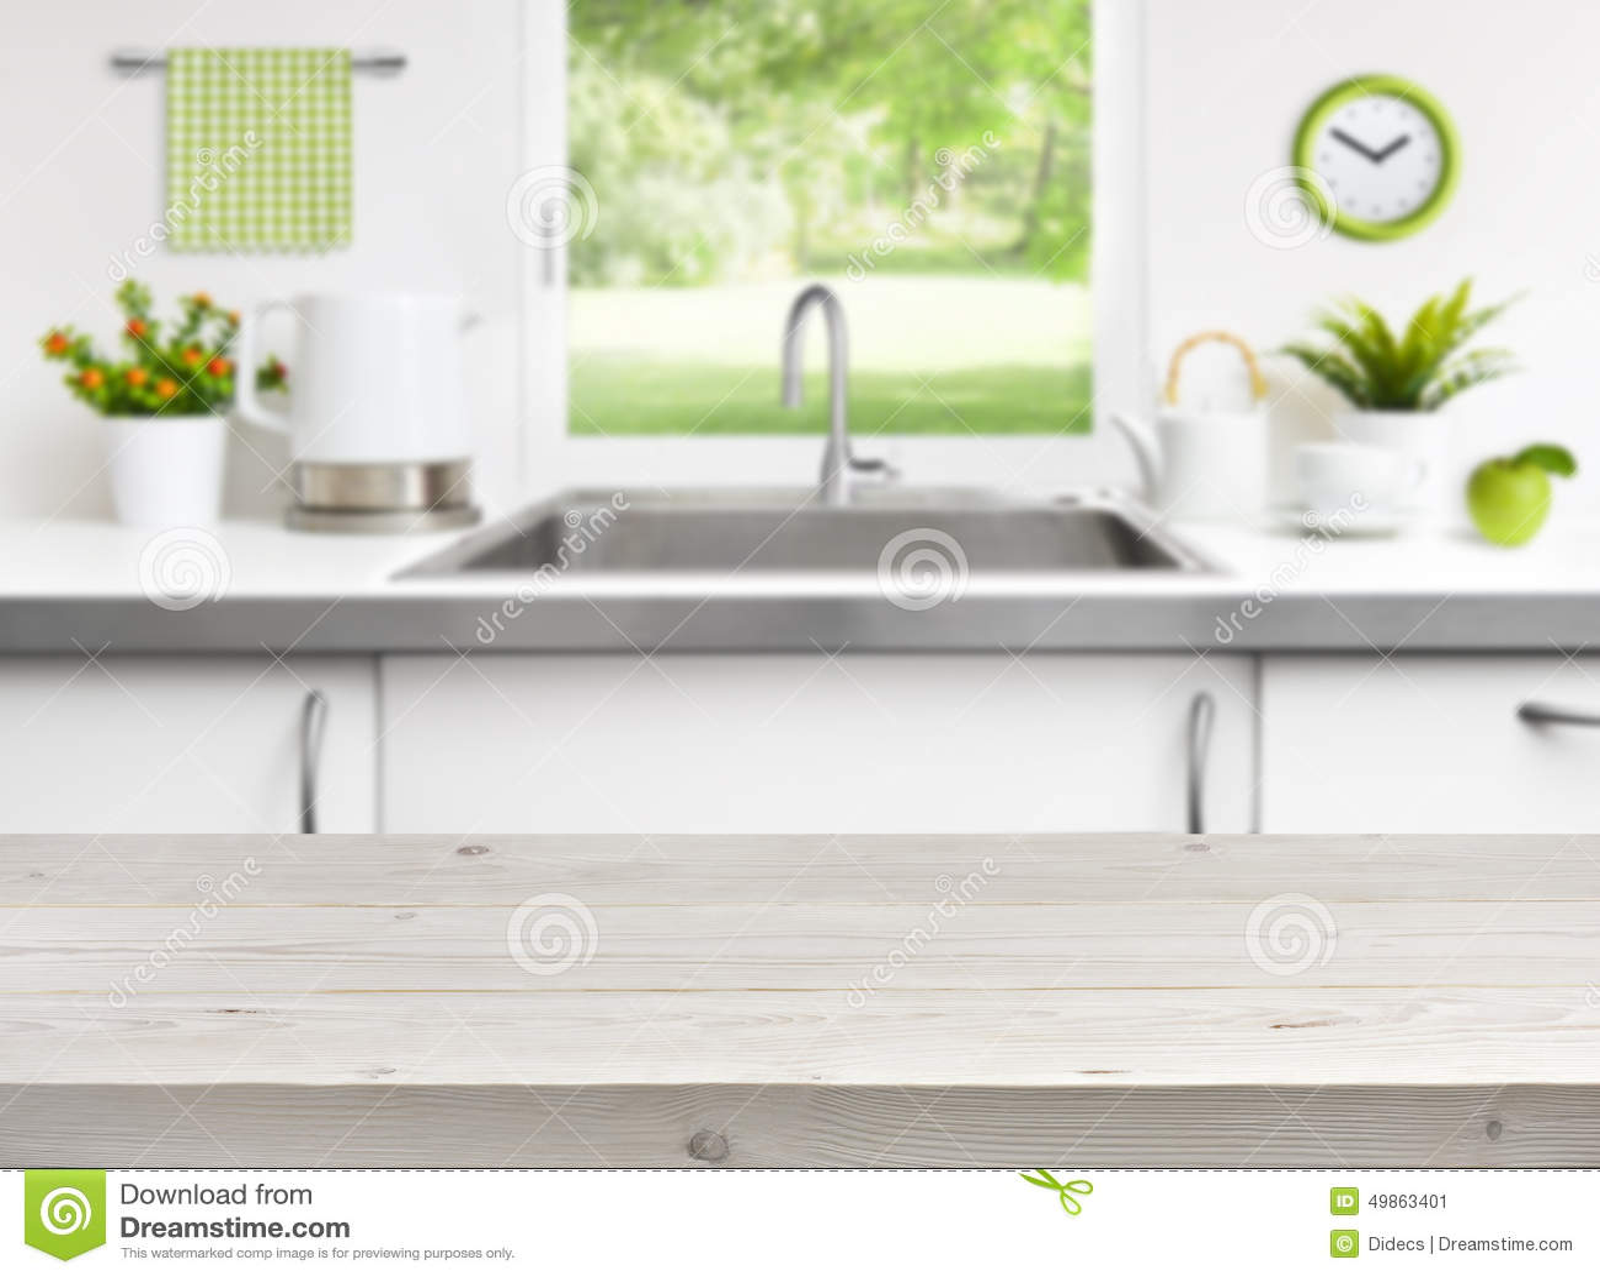 Wooden table on kitchen sink window background stock photo - Cucine con finestra sul lavello ...